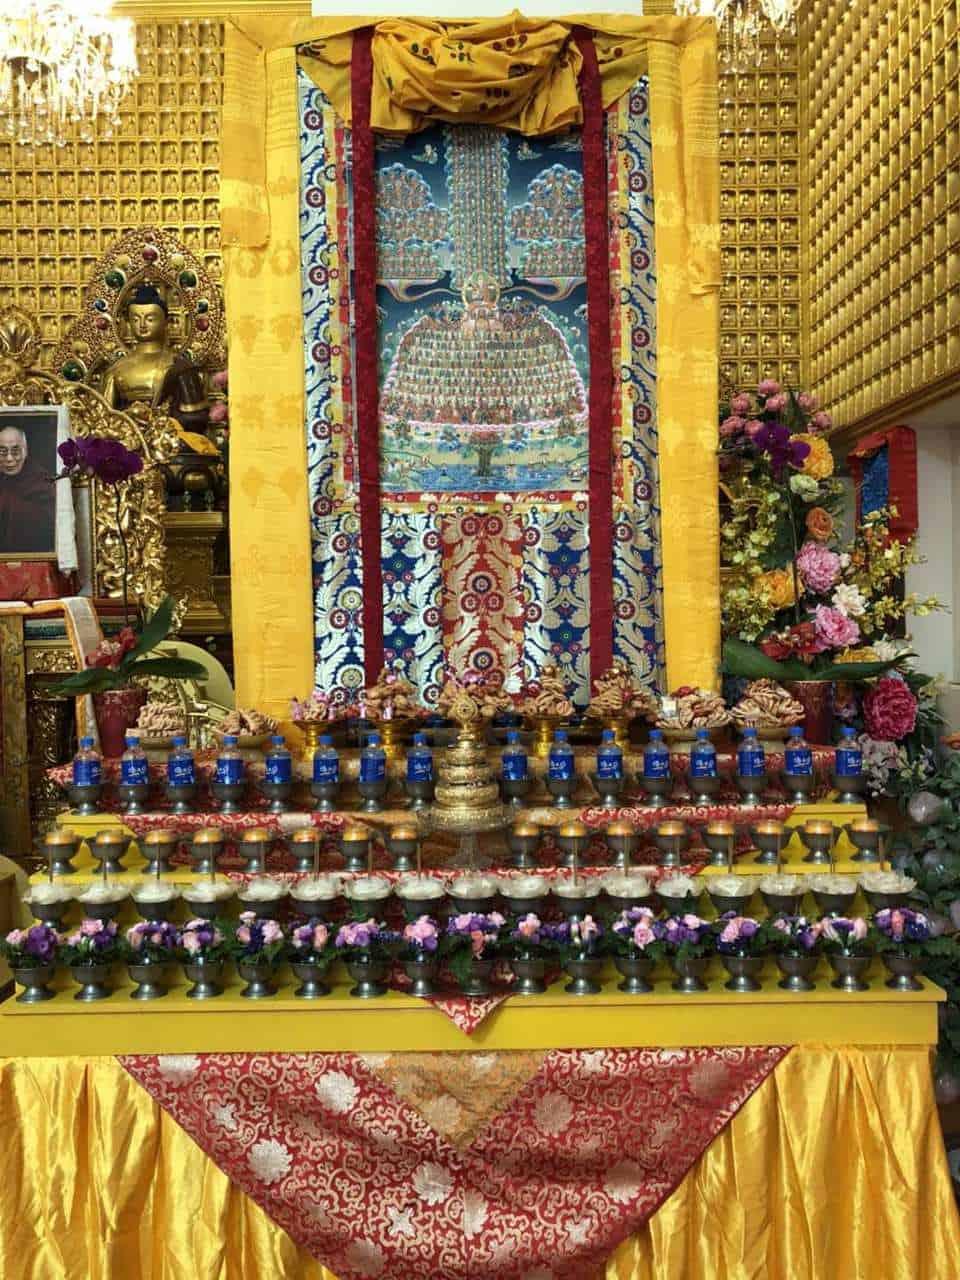 GosokRinpoche New Year 2018 Image_20180214115240